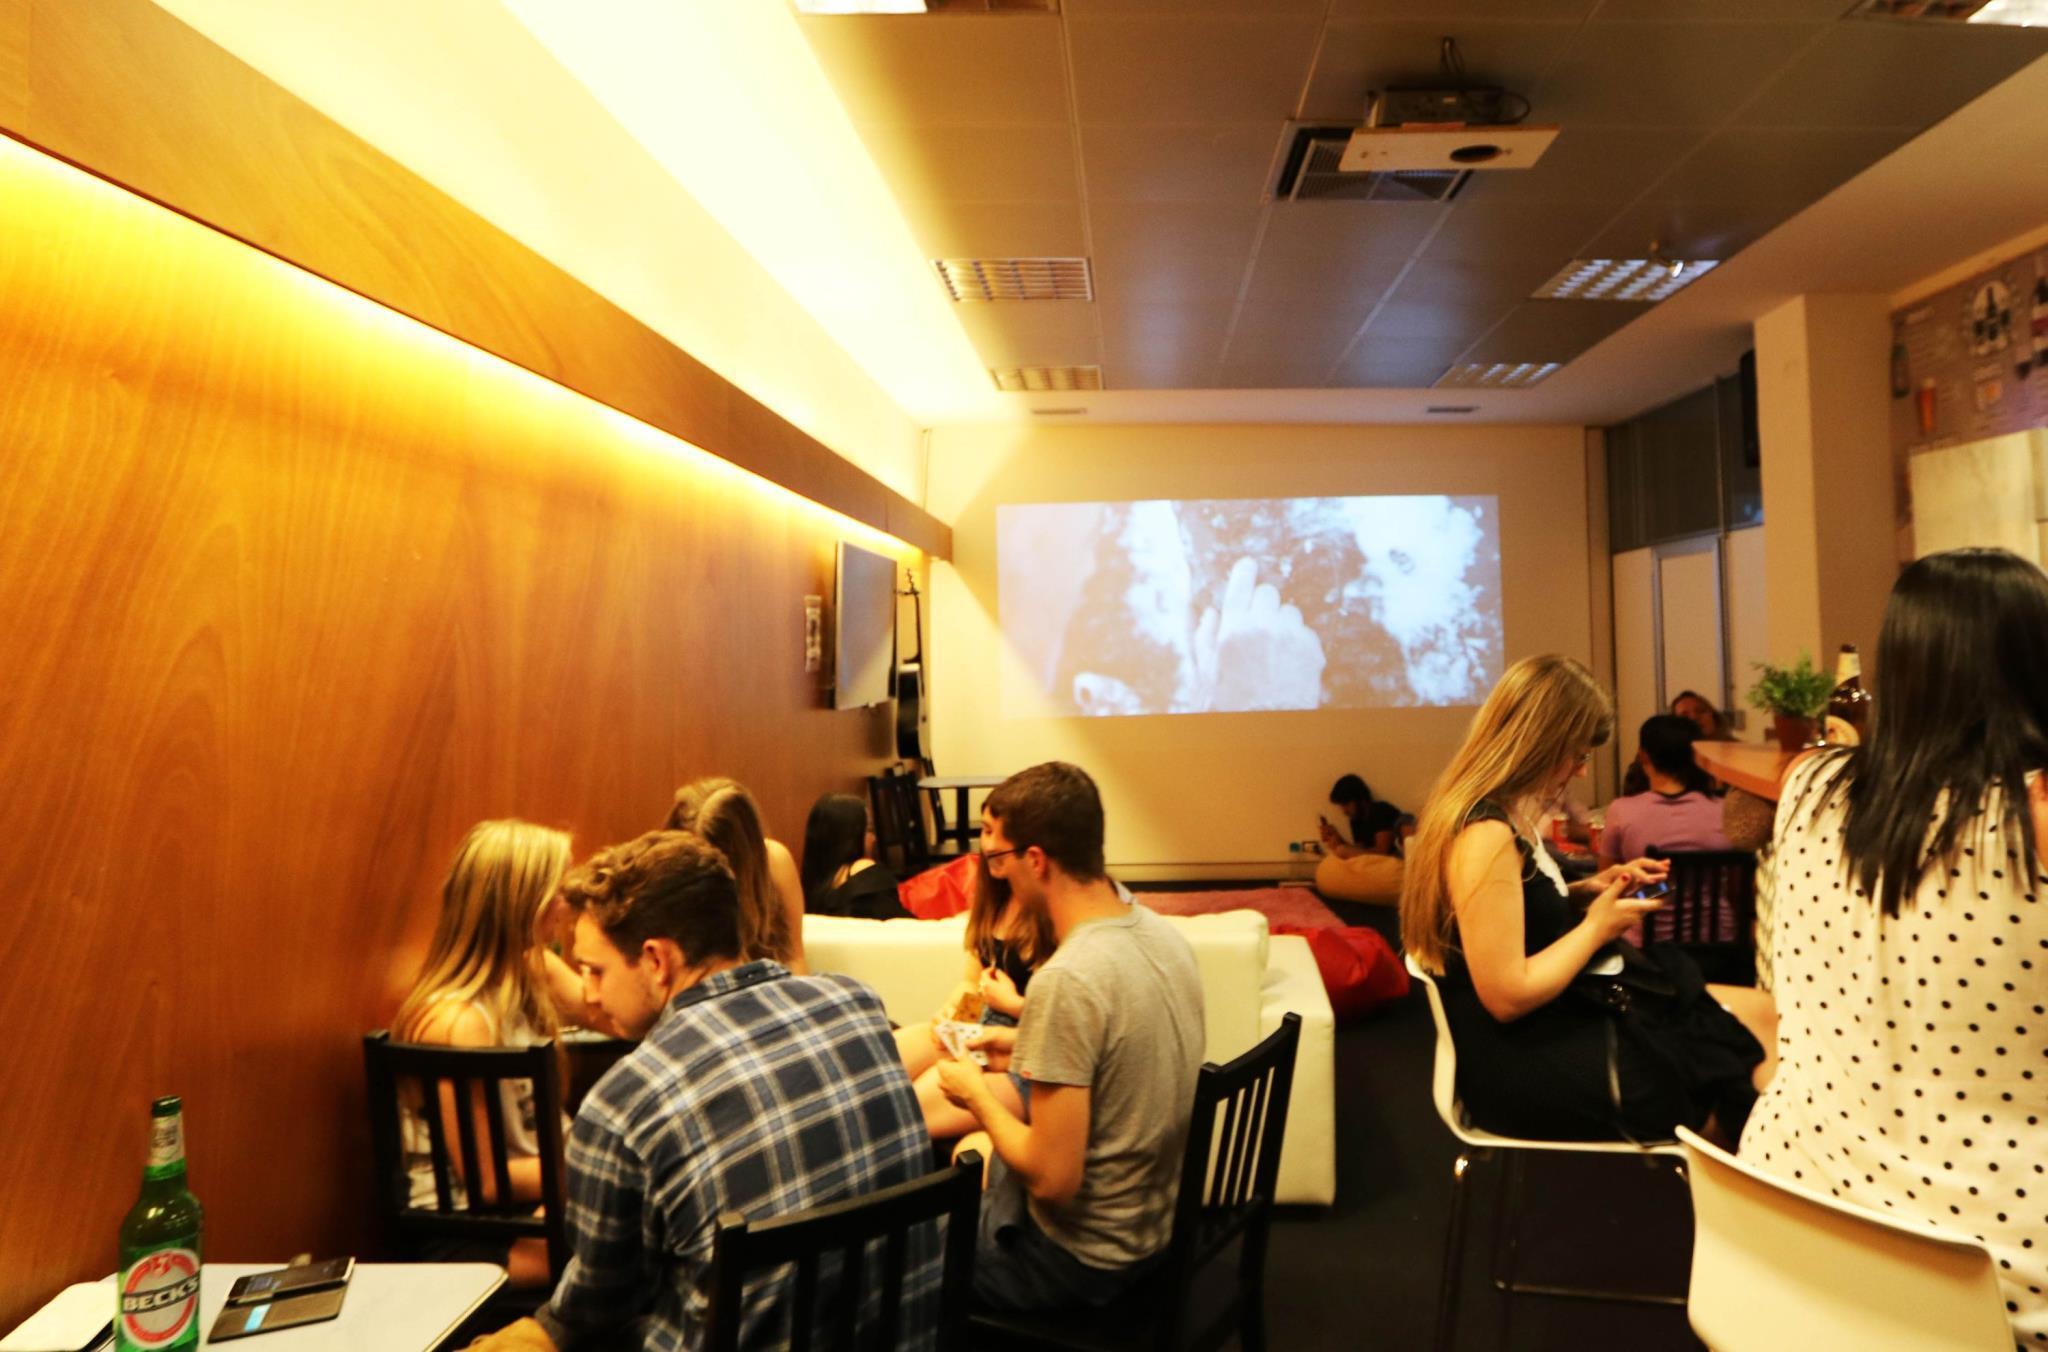 Milan koala hostel in italy europe for Hostel milan